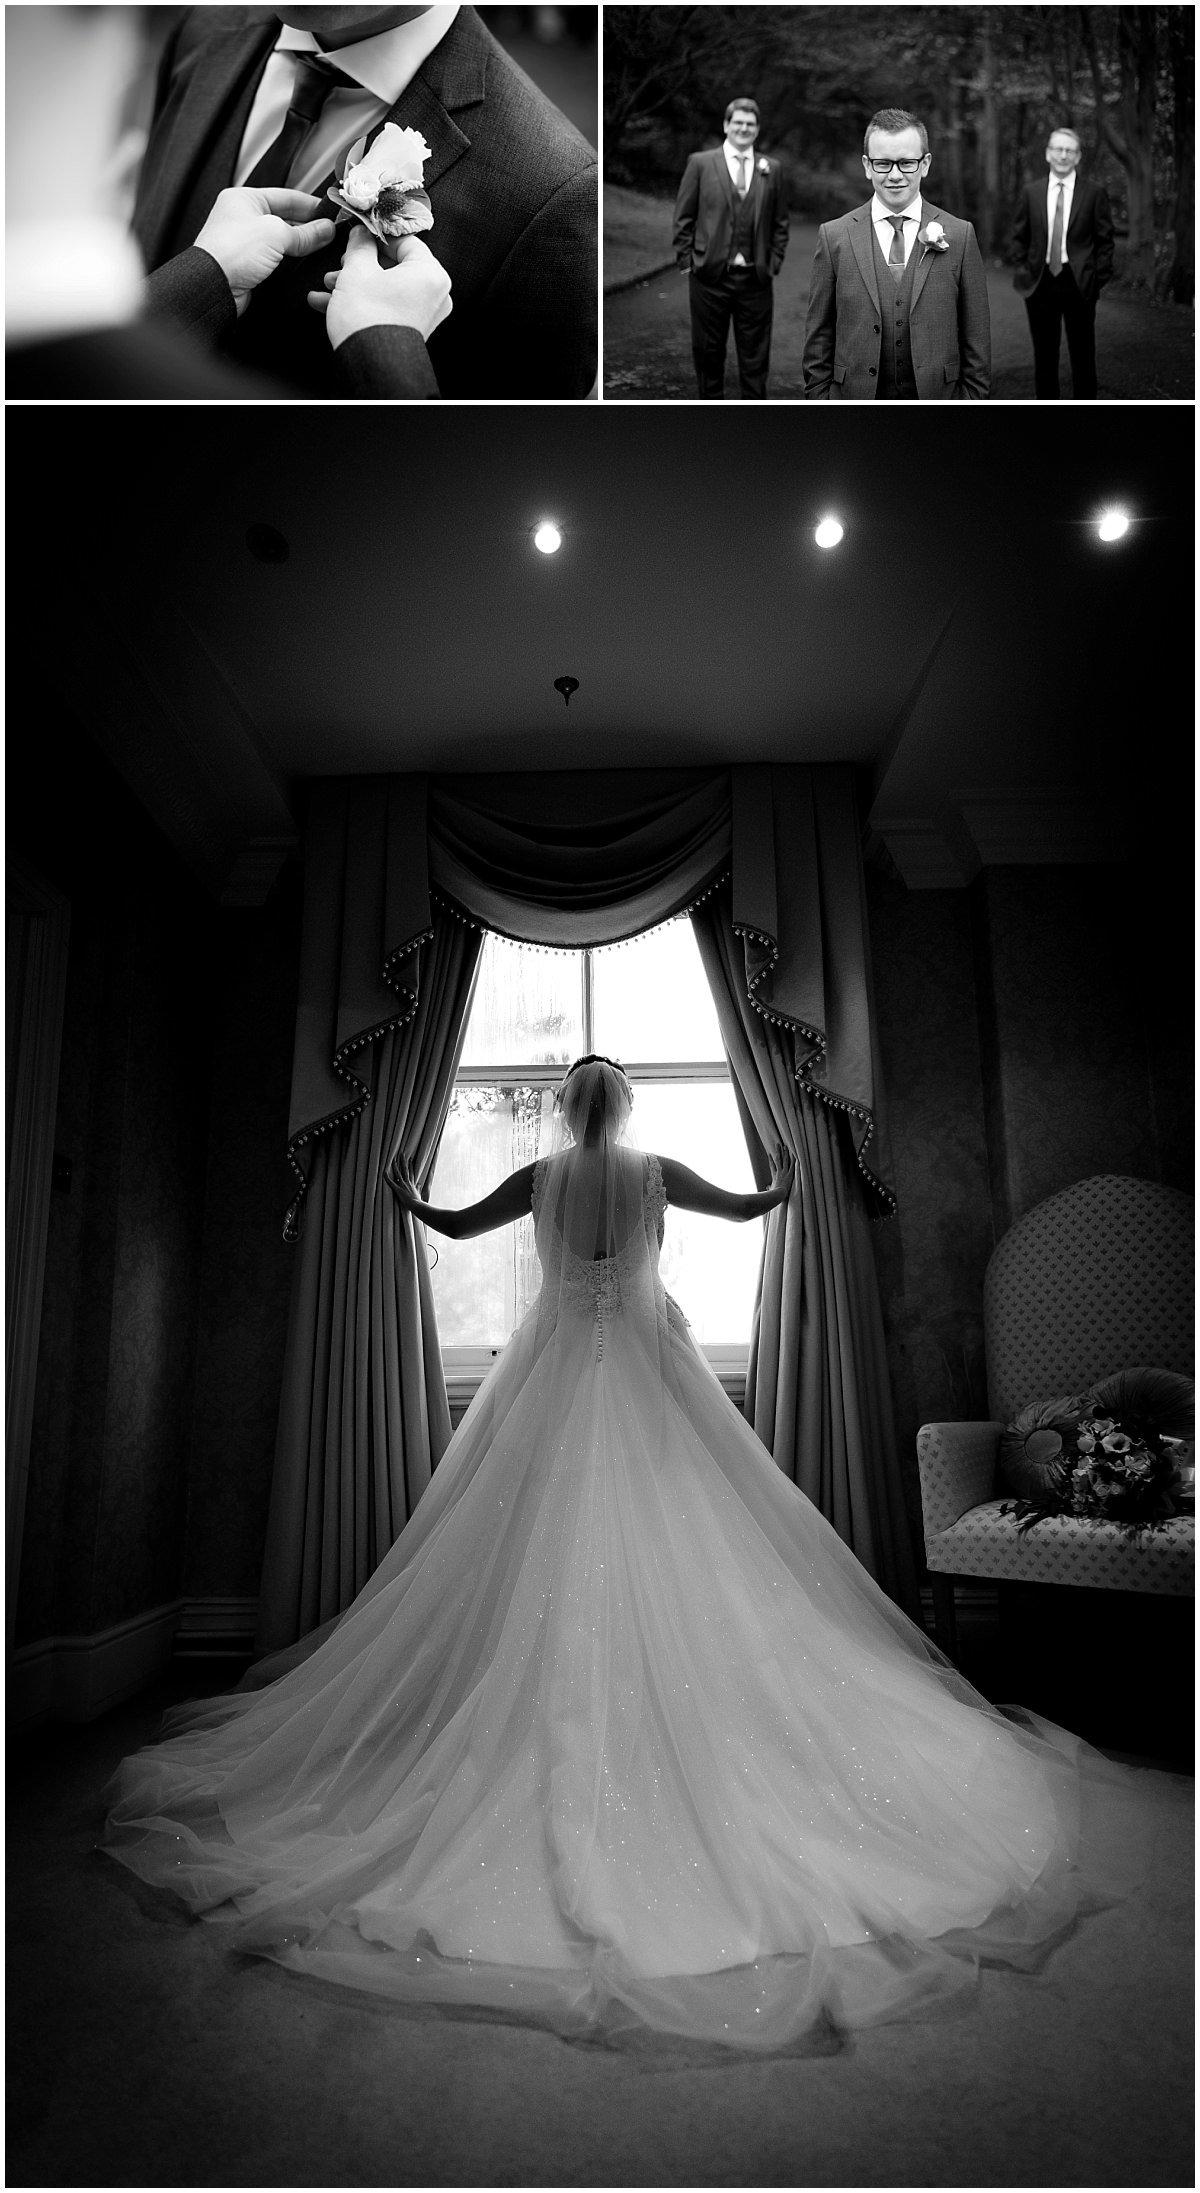 Wedding at Blackbrook House silhouette